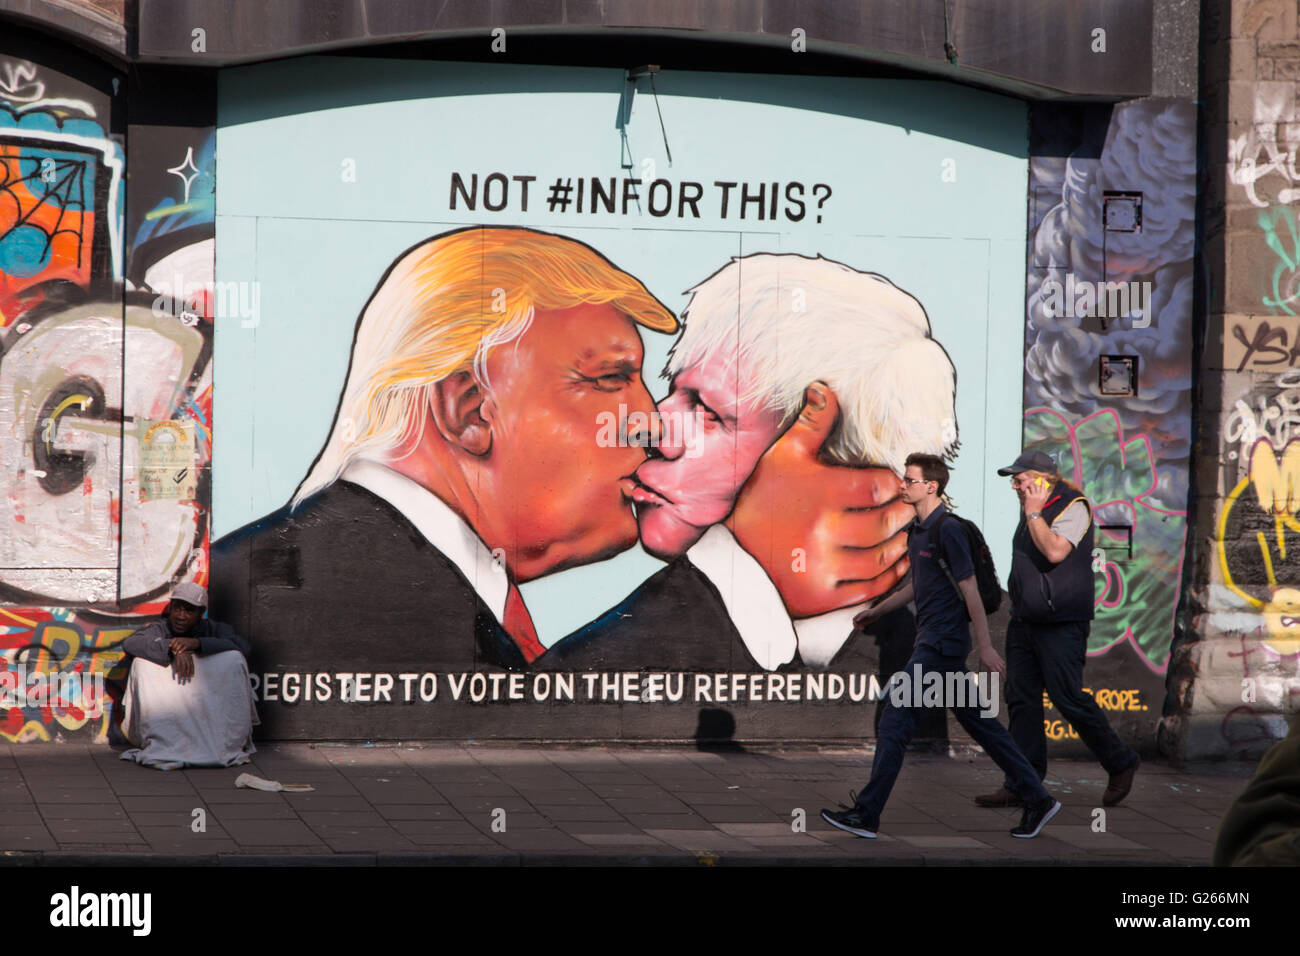 Satirical Street Art Showing Donald Trump Kissing Boris Johnson